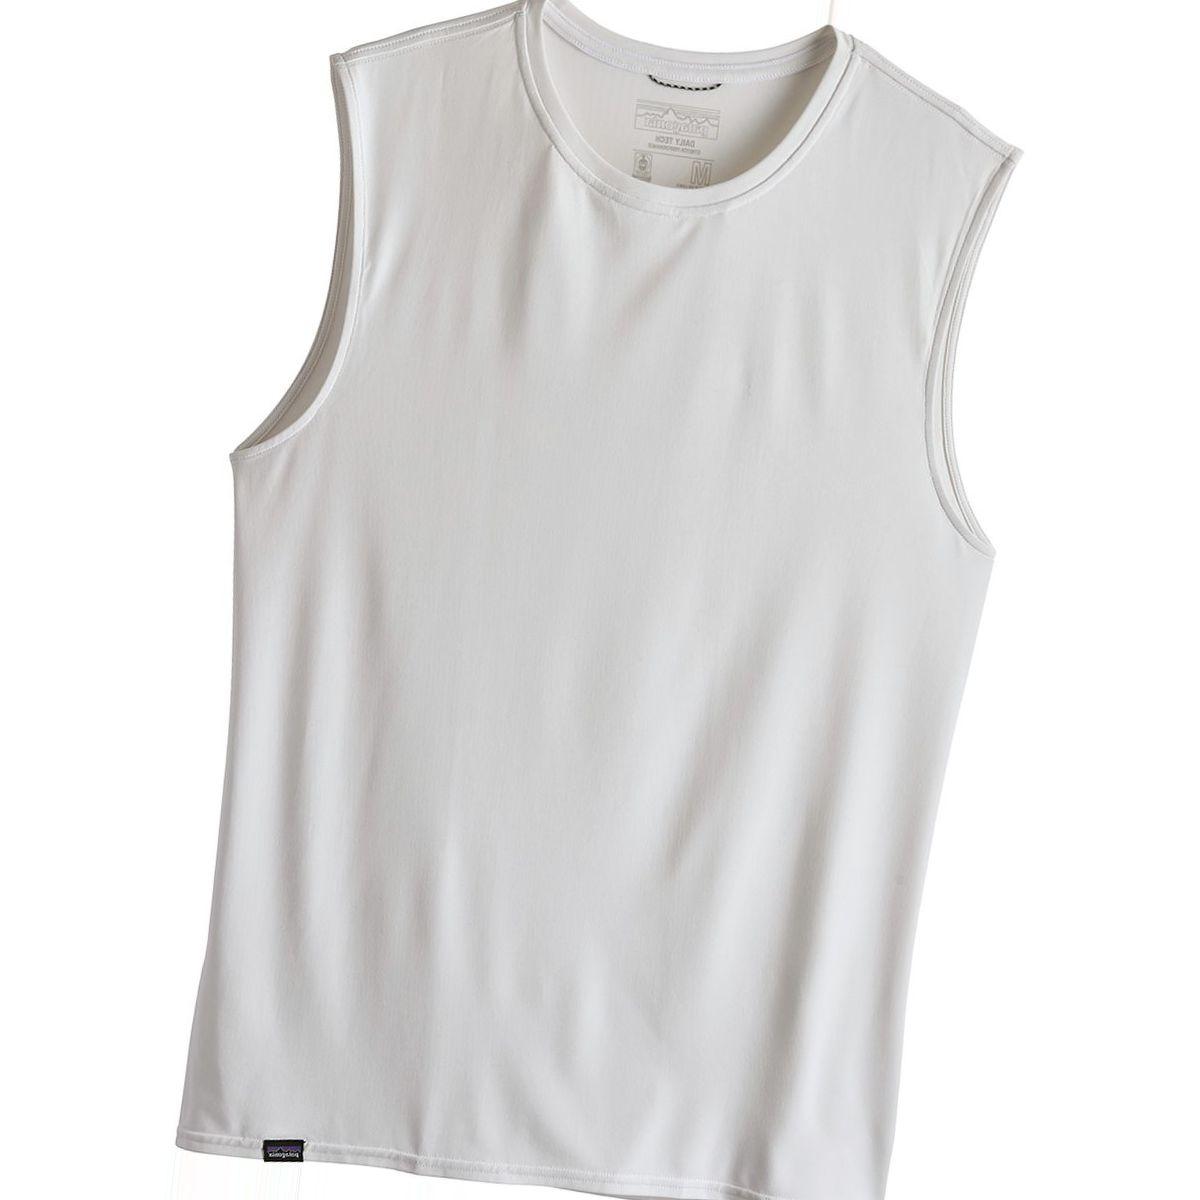 Patagonia Capilene Cool Daily Sleeveless Shirt - Men's